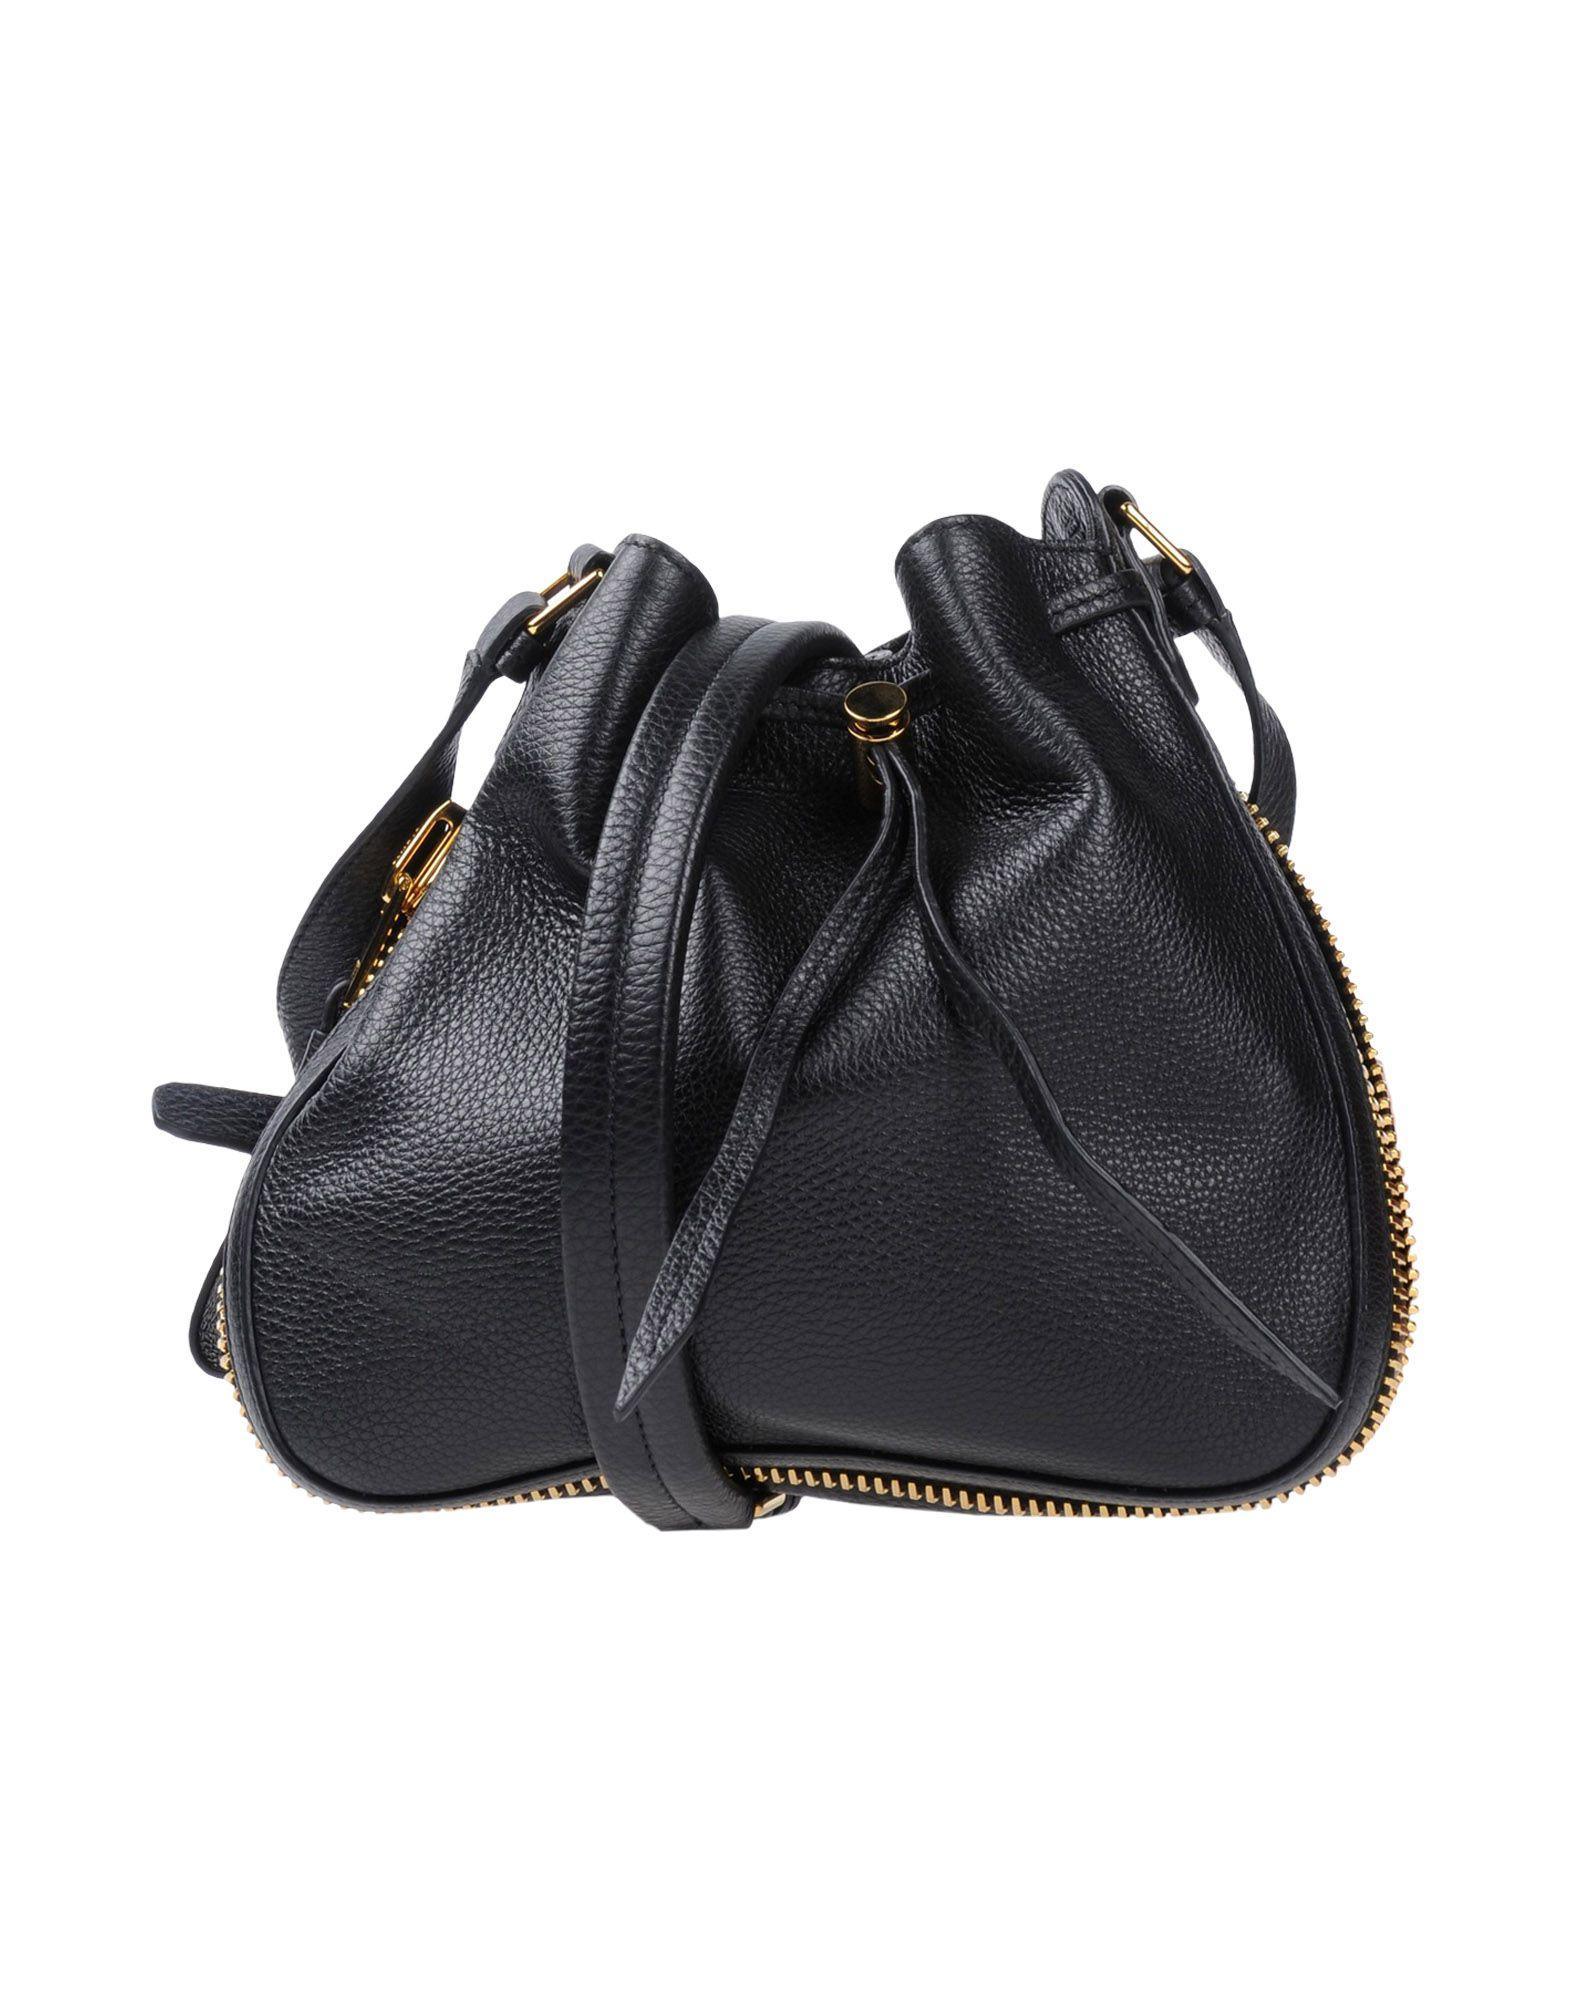 Tom Ford Across-body Bag In Black